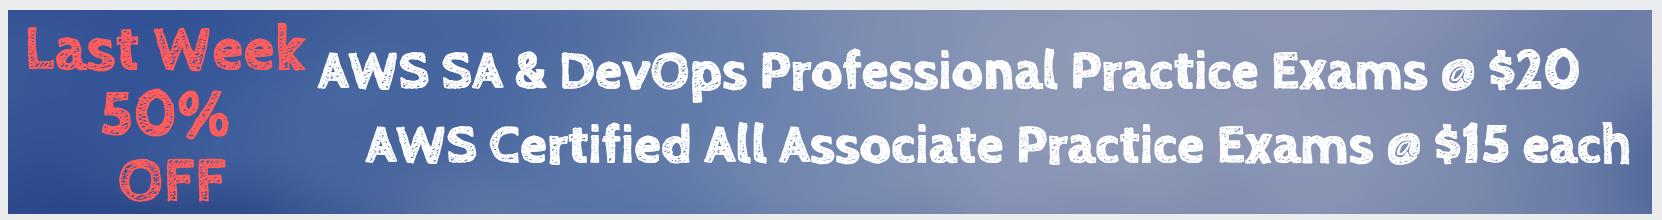 Braincert-AWS-Certified-SA-Professional-Practice-Exam